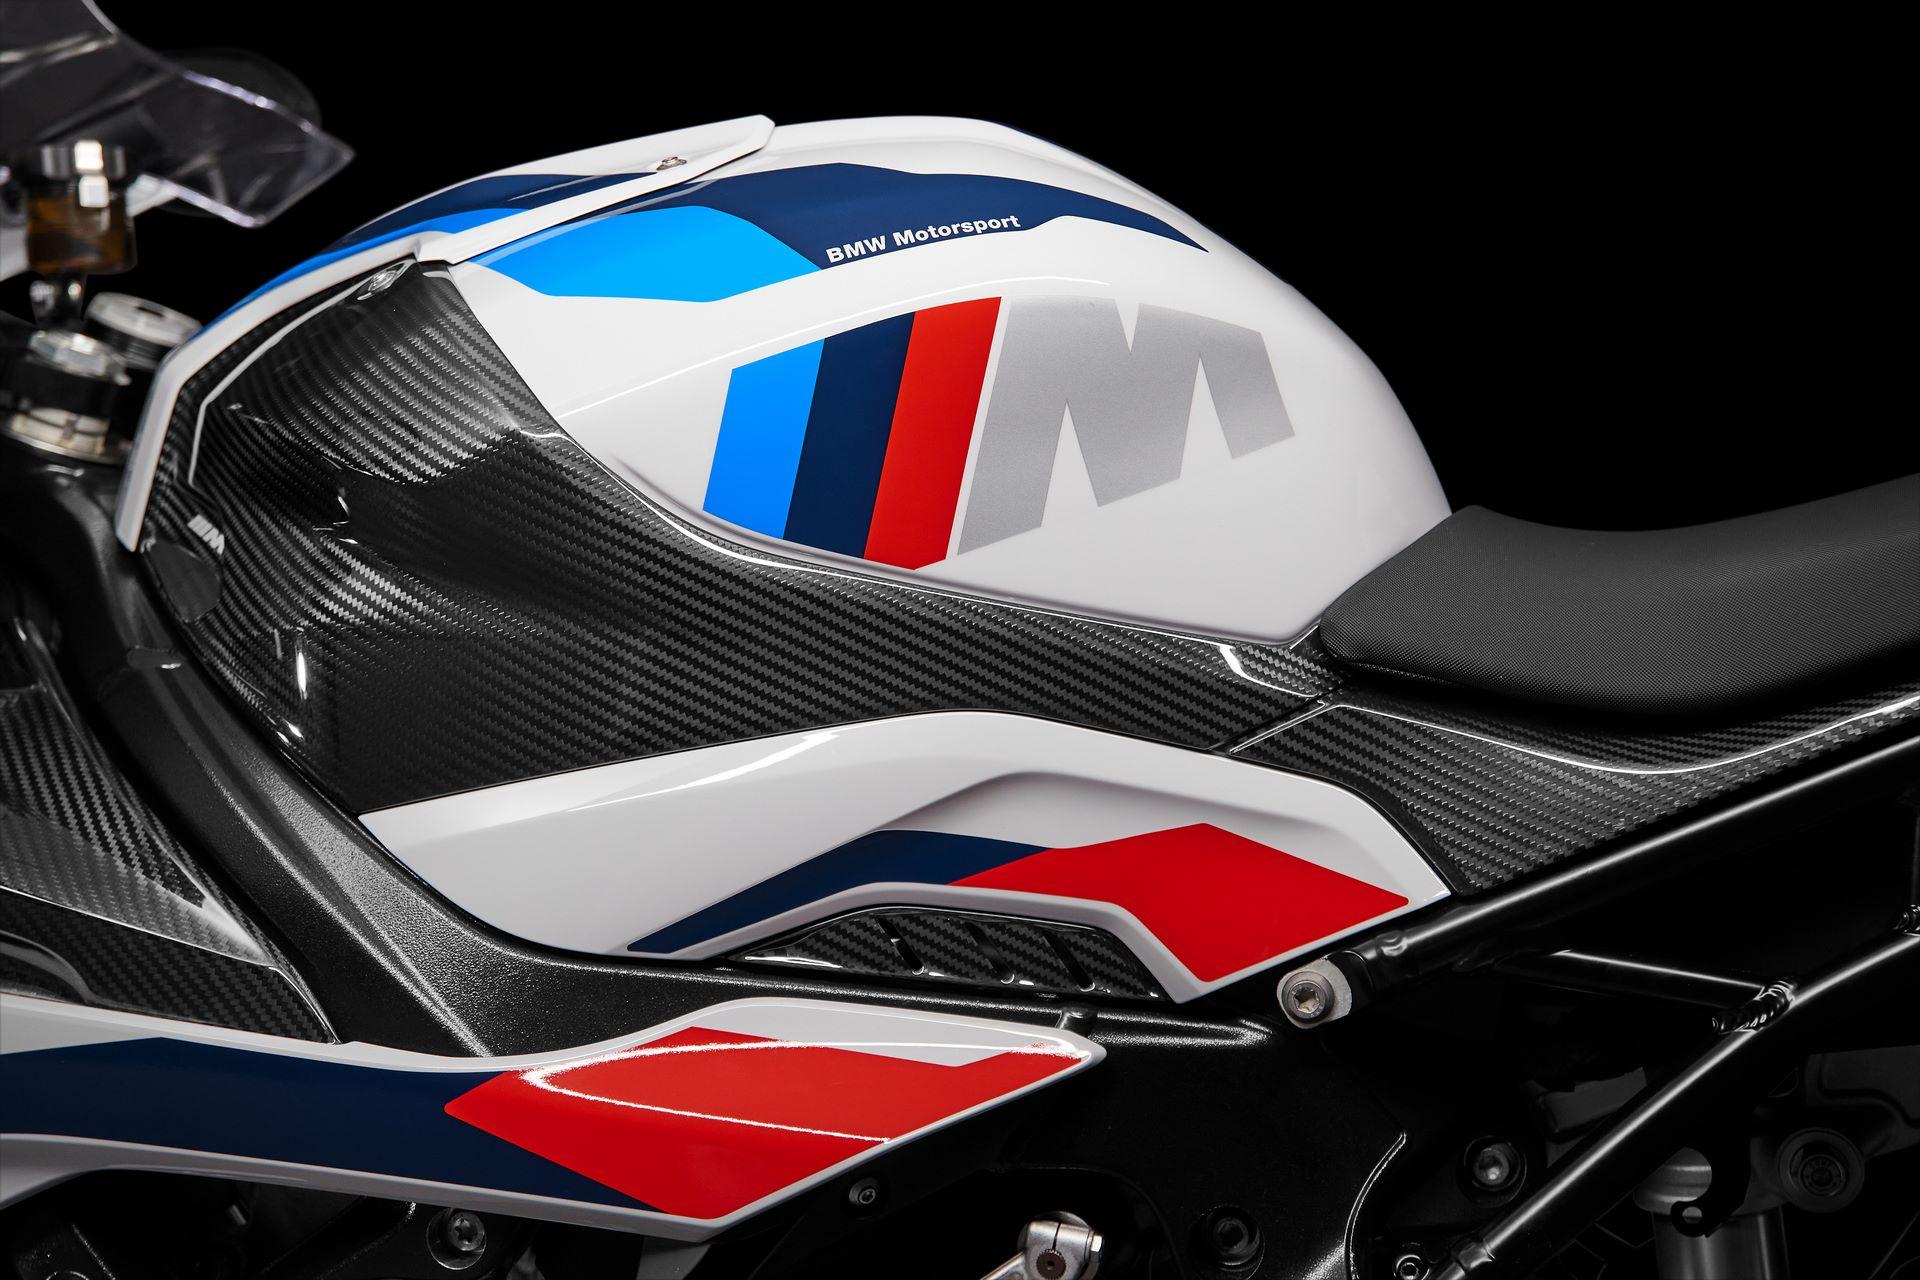 BMW-M-1000-RR-8